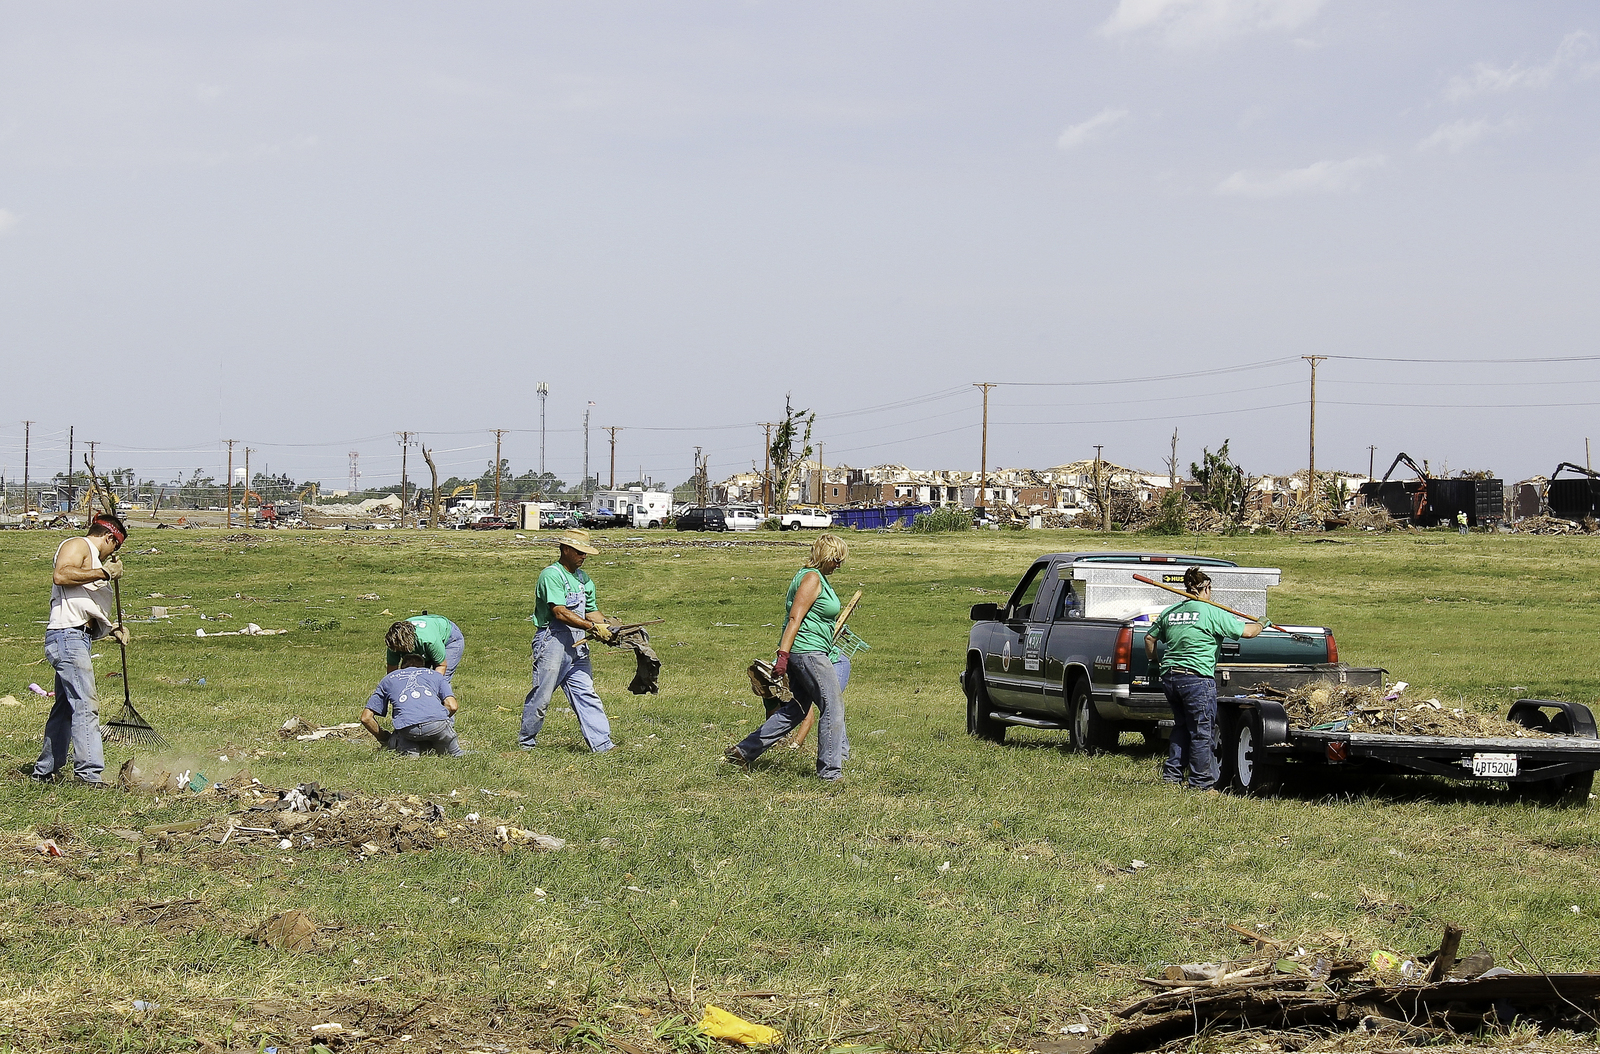 Severe Storm ^ Tornado - Joplin, Mo. , June 25, 2011  -  Volunteers collect debris along Duquesne Street, after an EF-5 tornado struck the cities of Joplin and Duquesne on May 22. - Photo by: Rossyveth Rey-Berríos/FEMA